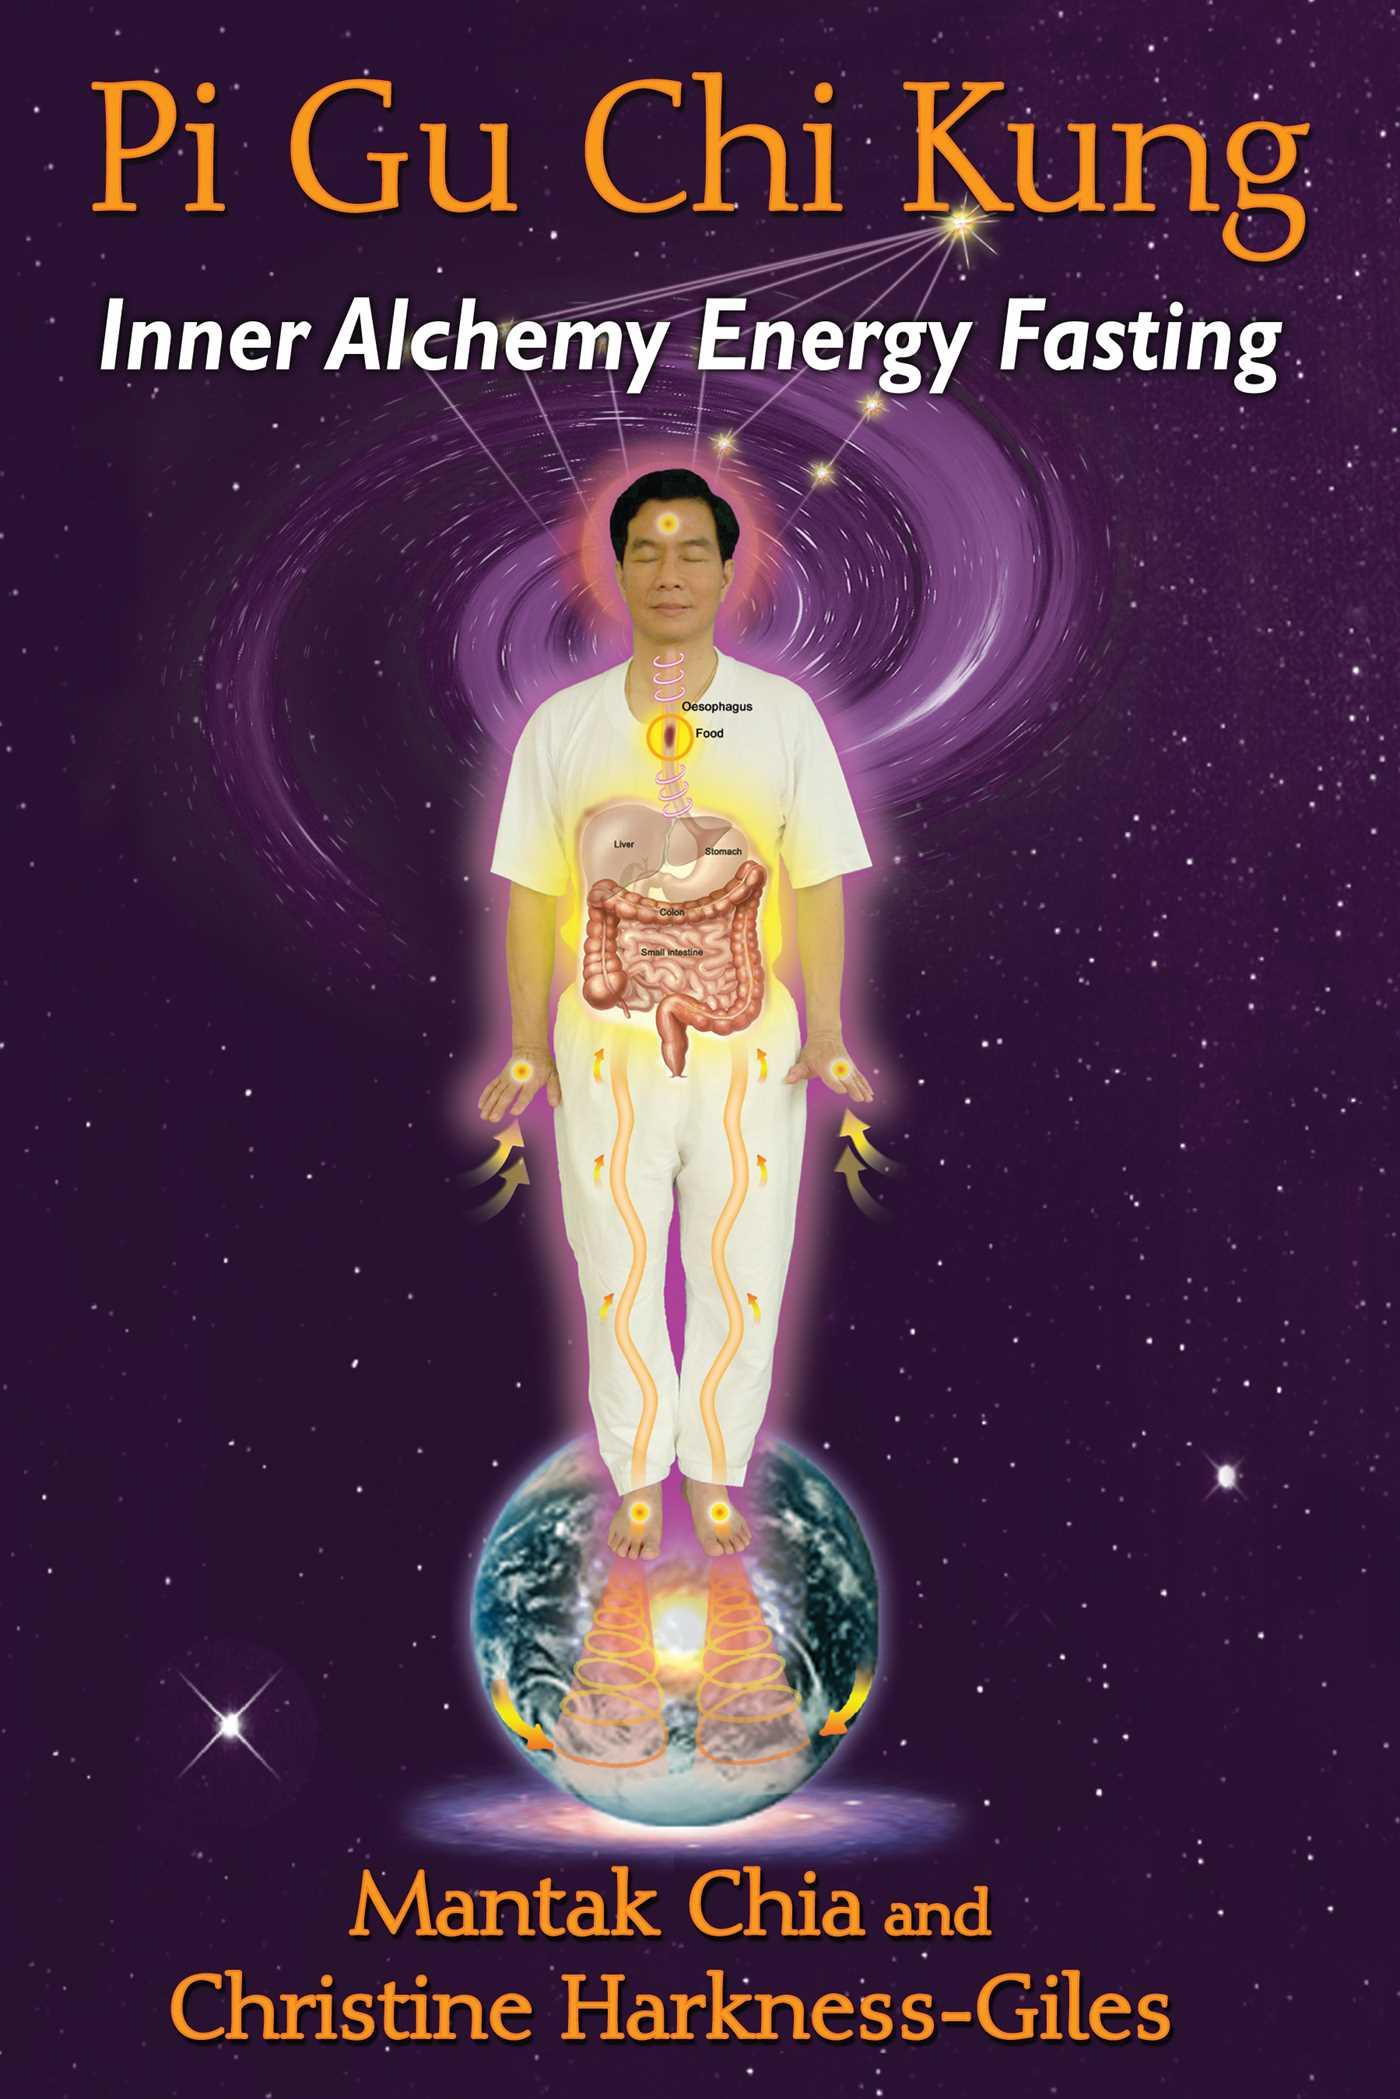 What Is Pi Gu Energy Fasting Food